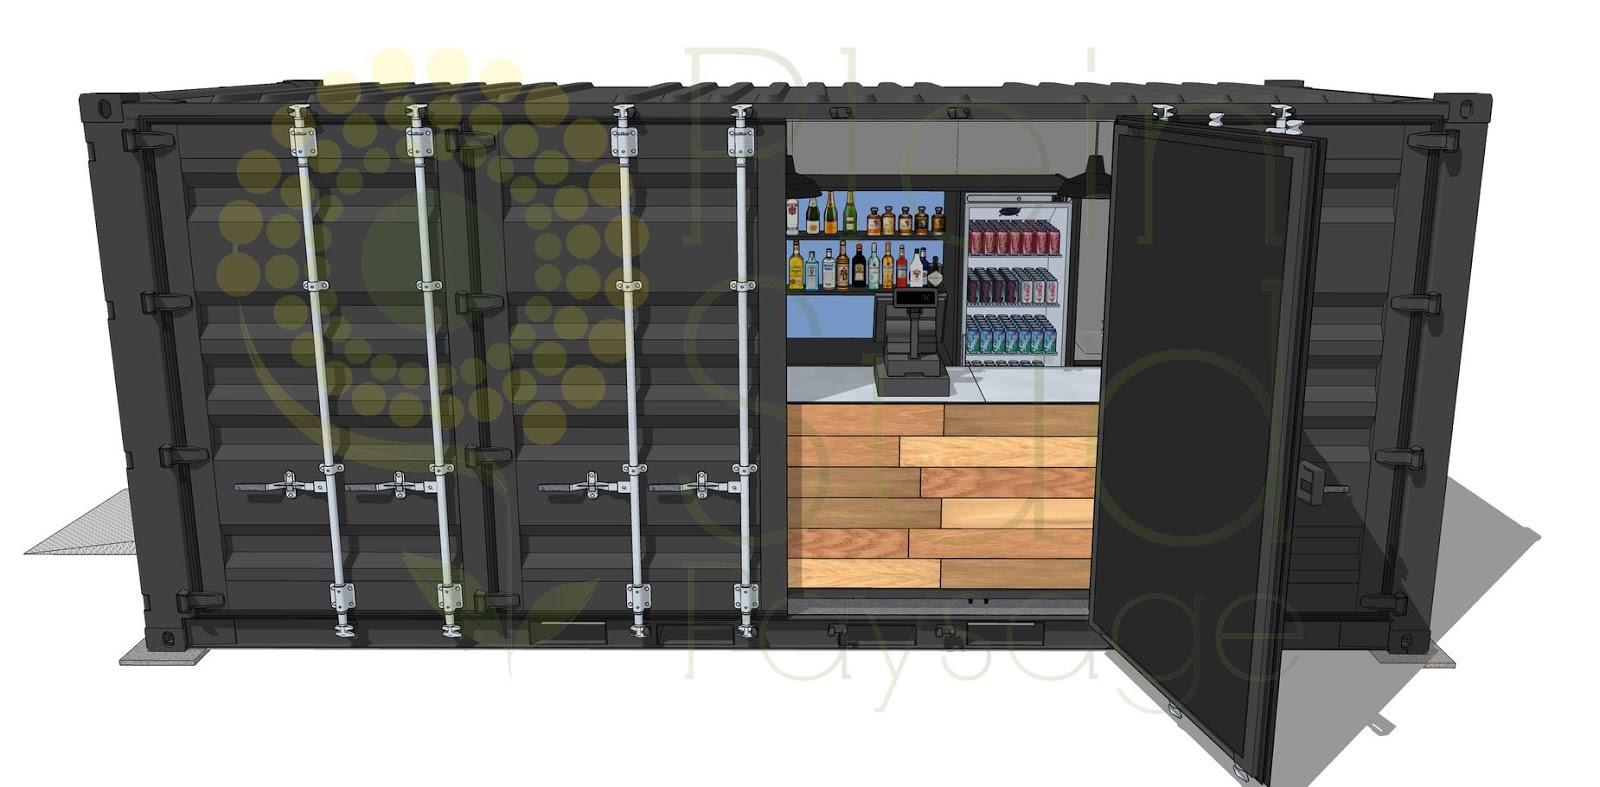 Container Aménagé Studio Prix aménagements extérieurs / carports / containers maritimes